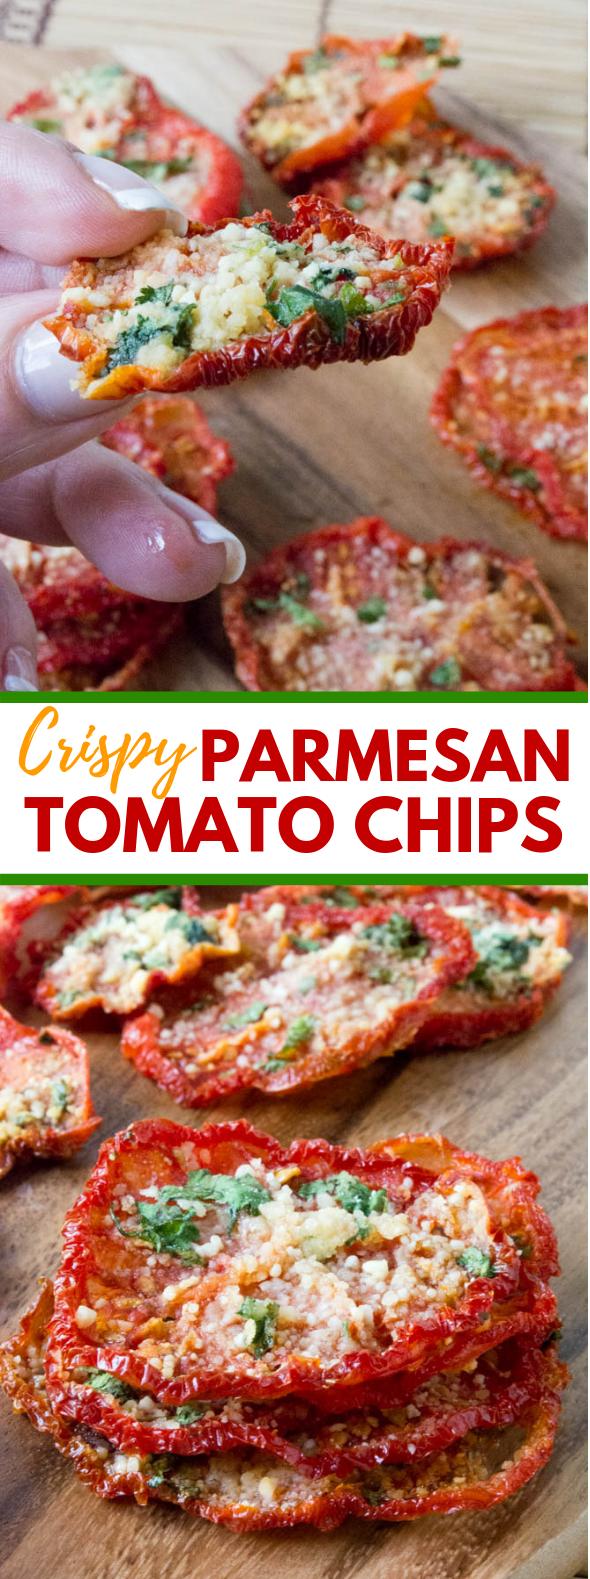 CRISPY PARMESAN TOMATO CHIPS #lowcarb #glutenfree